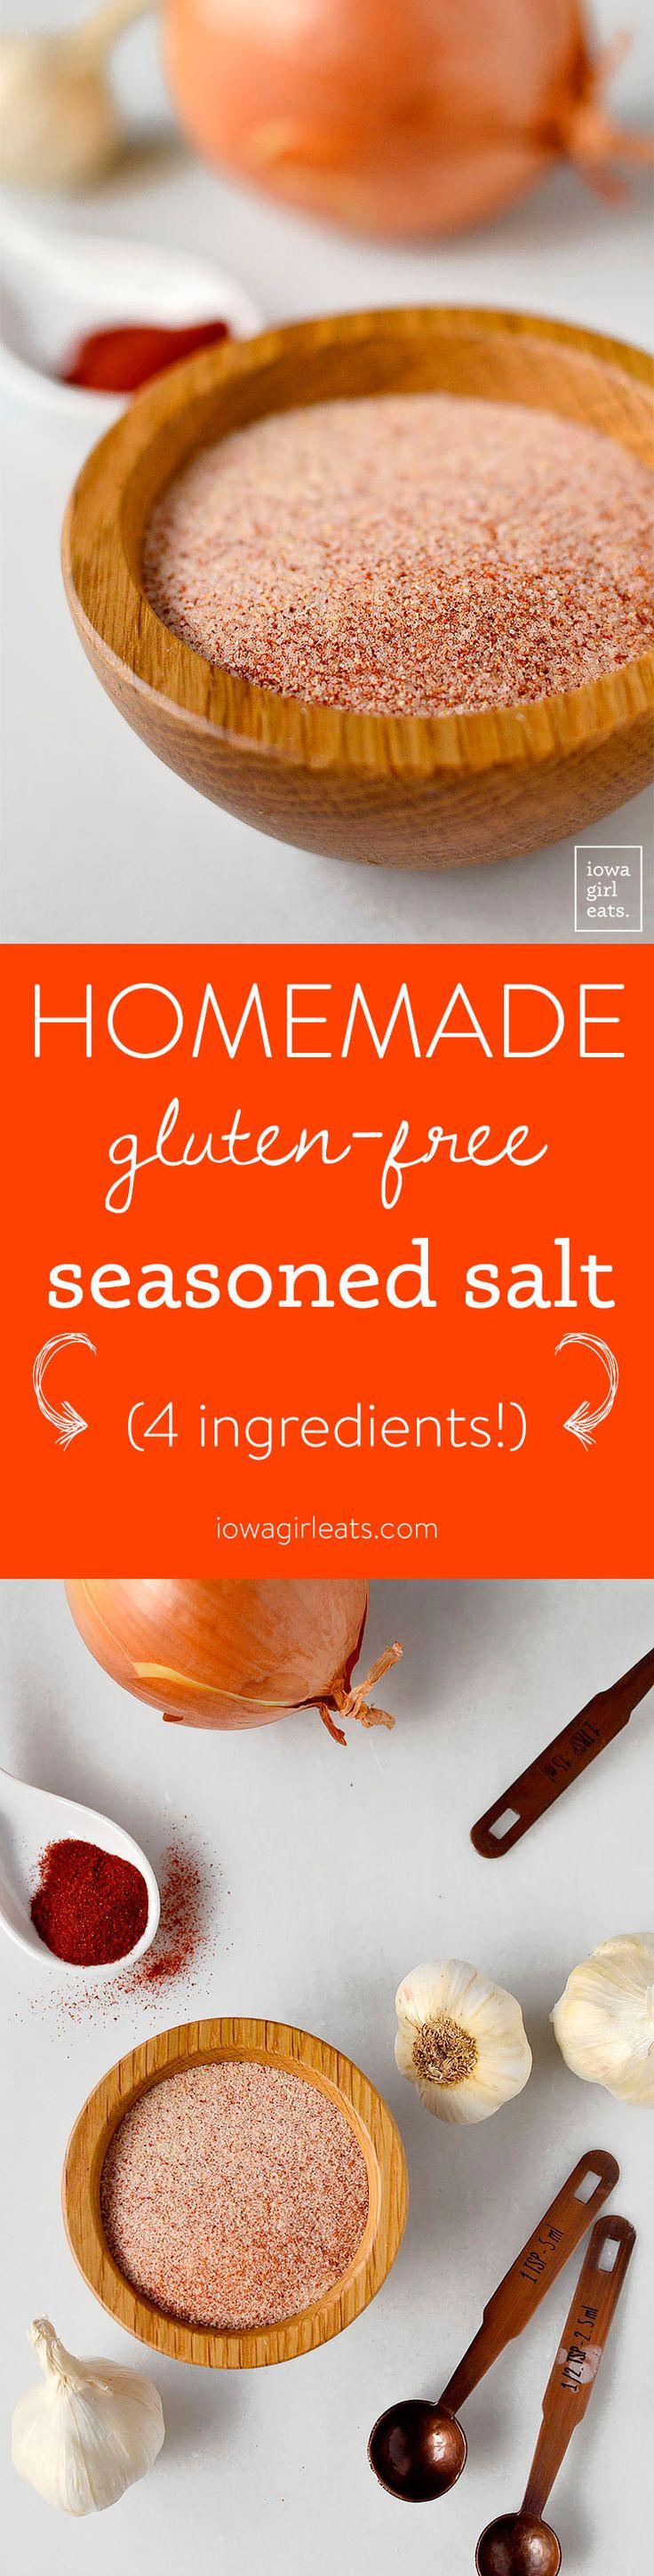 Homemade Gluten Free Seasoned Salt plus 10 Ways to Use It  | http://iowagirleats.com/